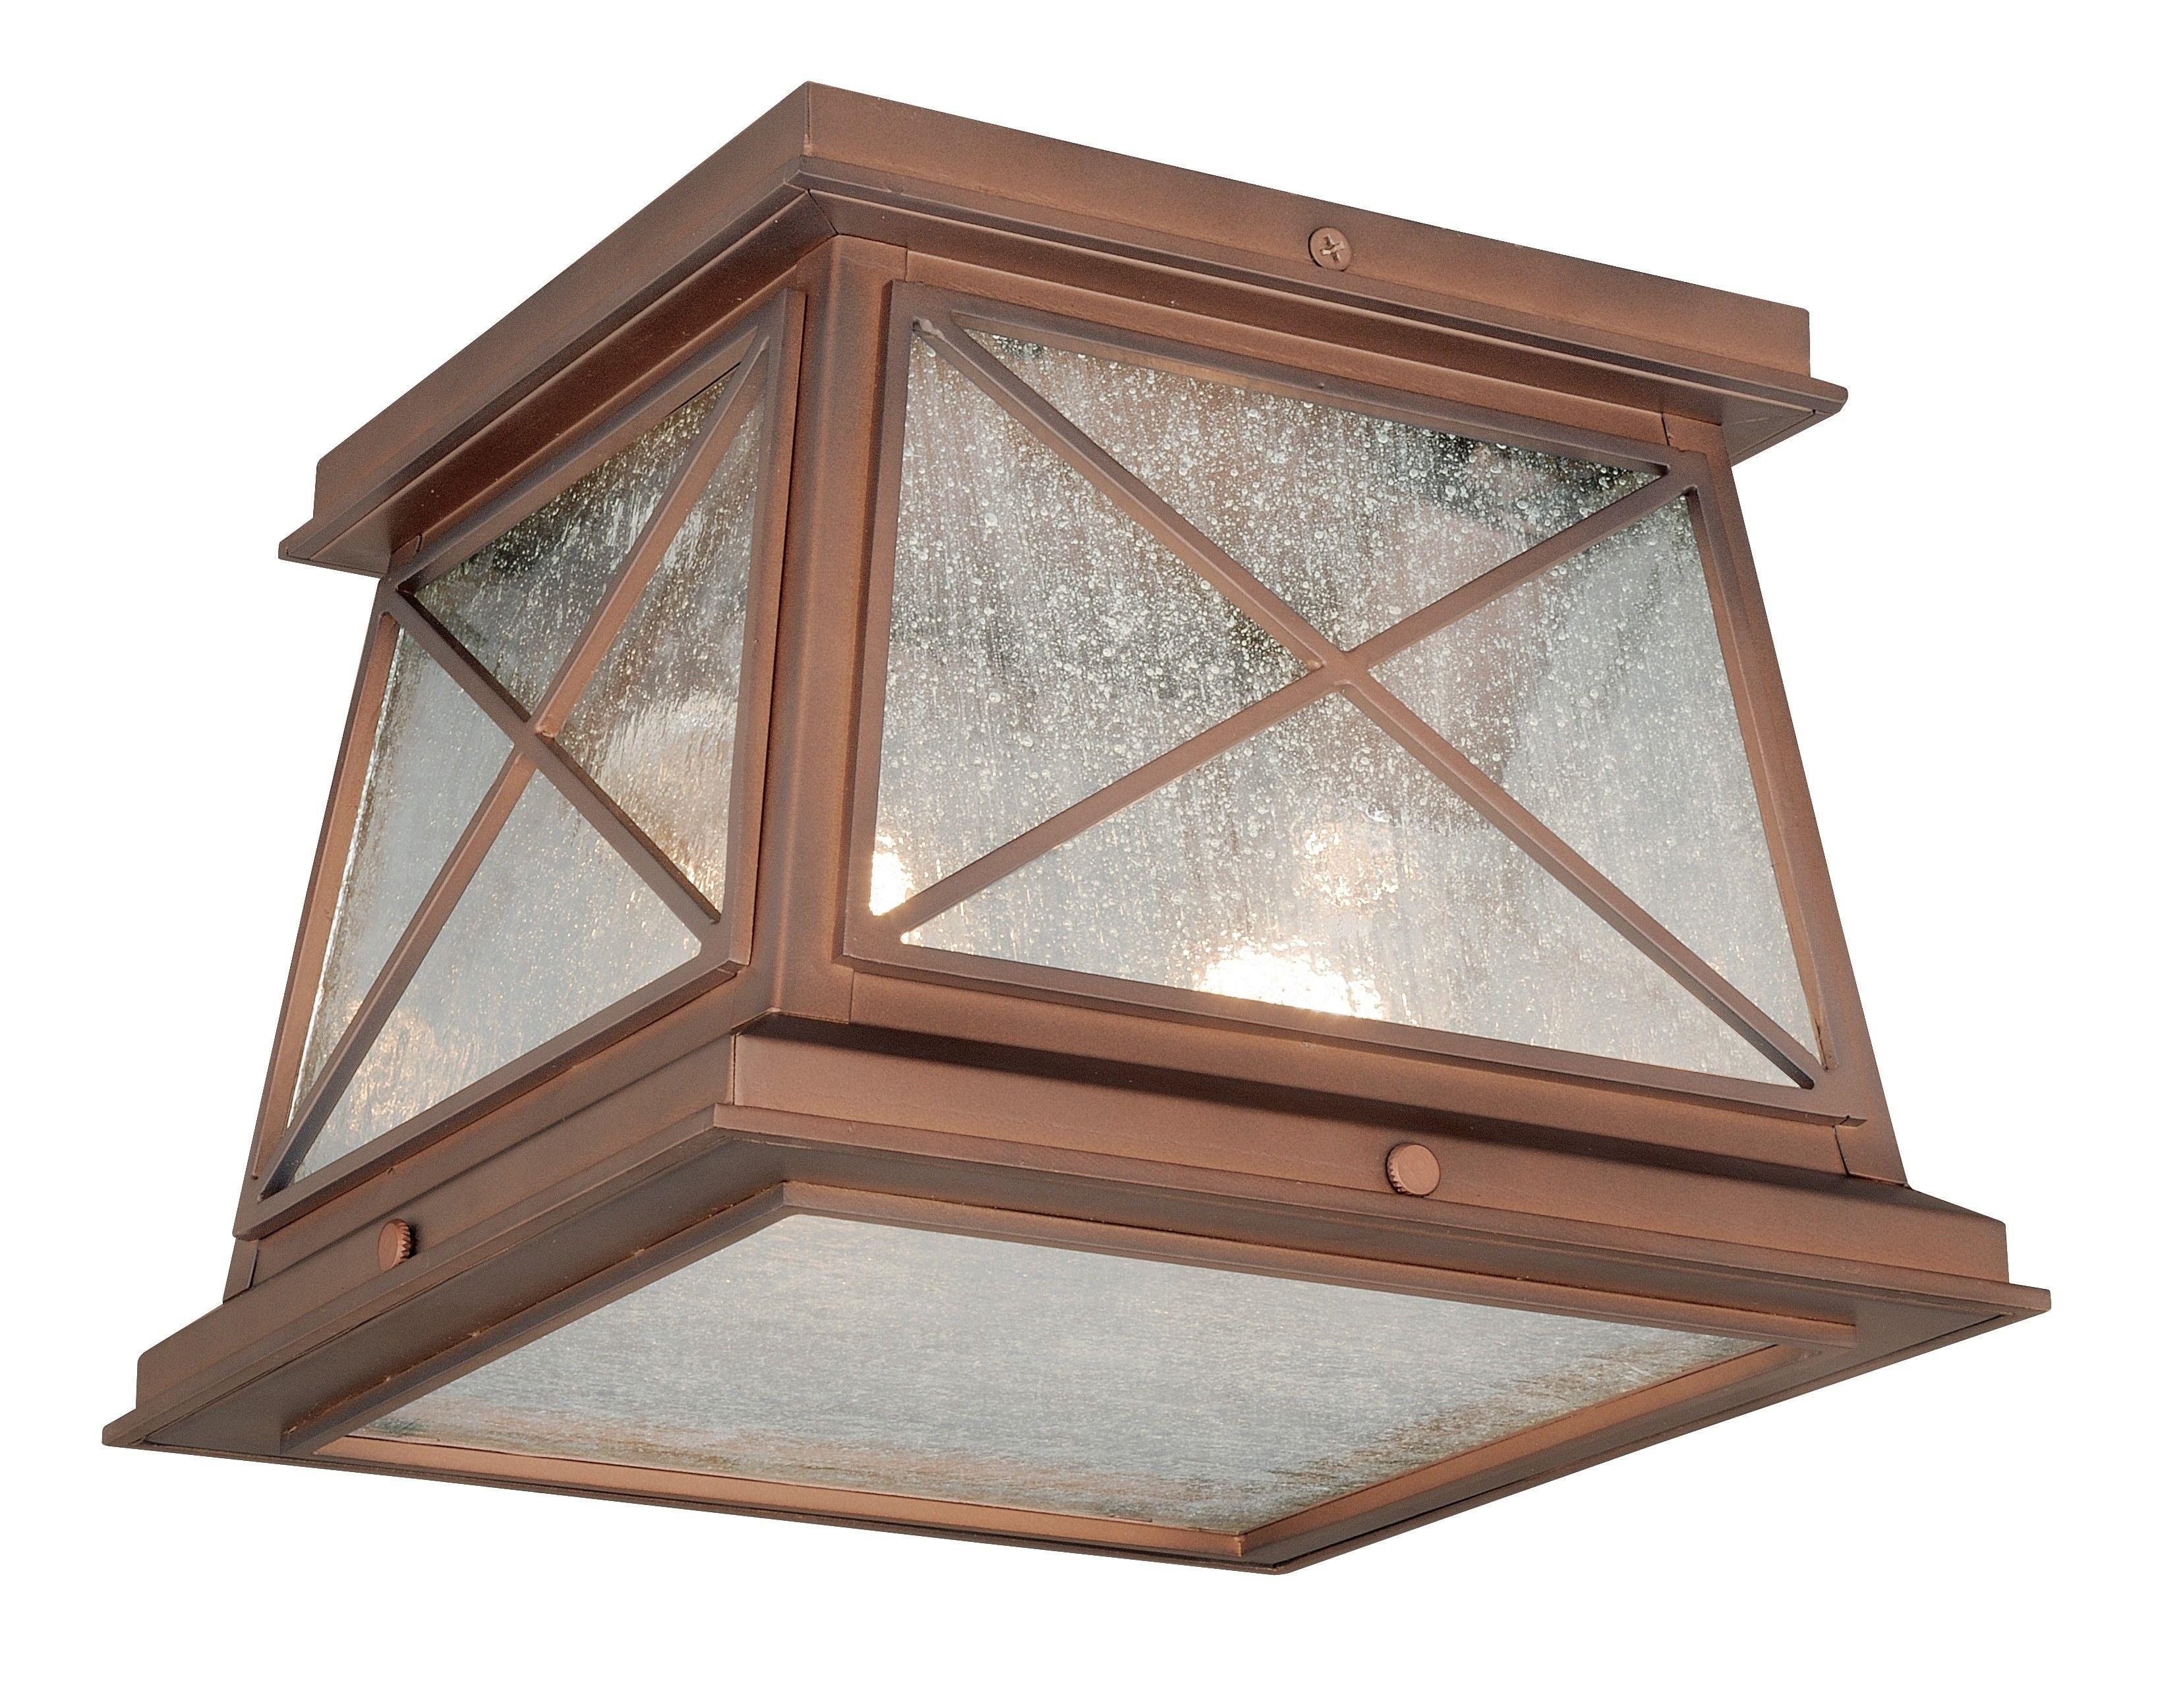 Vaxcel Lighting T0065 Mackinac 9 Outdoor Flush Mount Antique Red Copper Outdoor Flush Mounts Copper Outdoor Lighting Outdoor Ceiling Lights